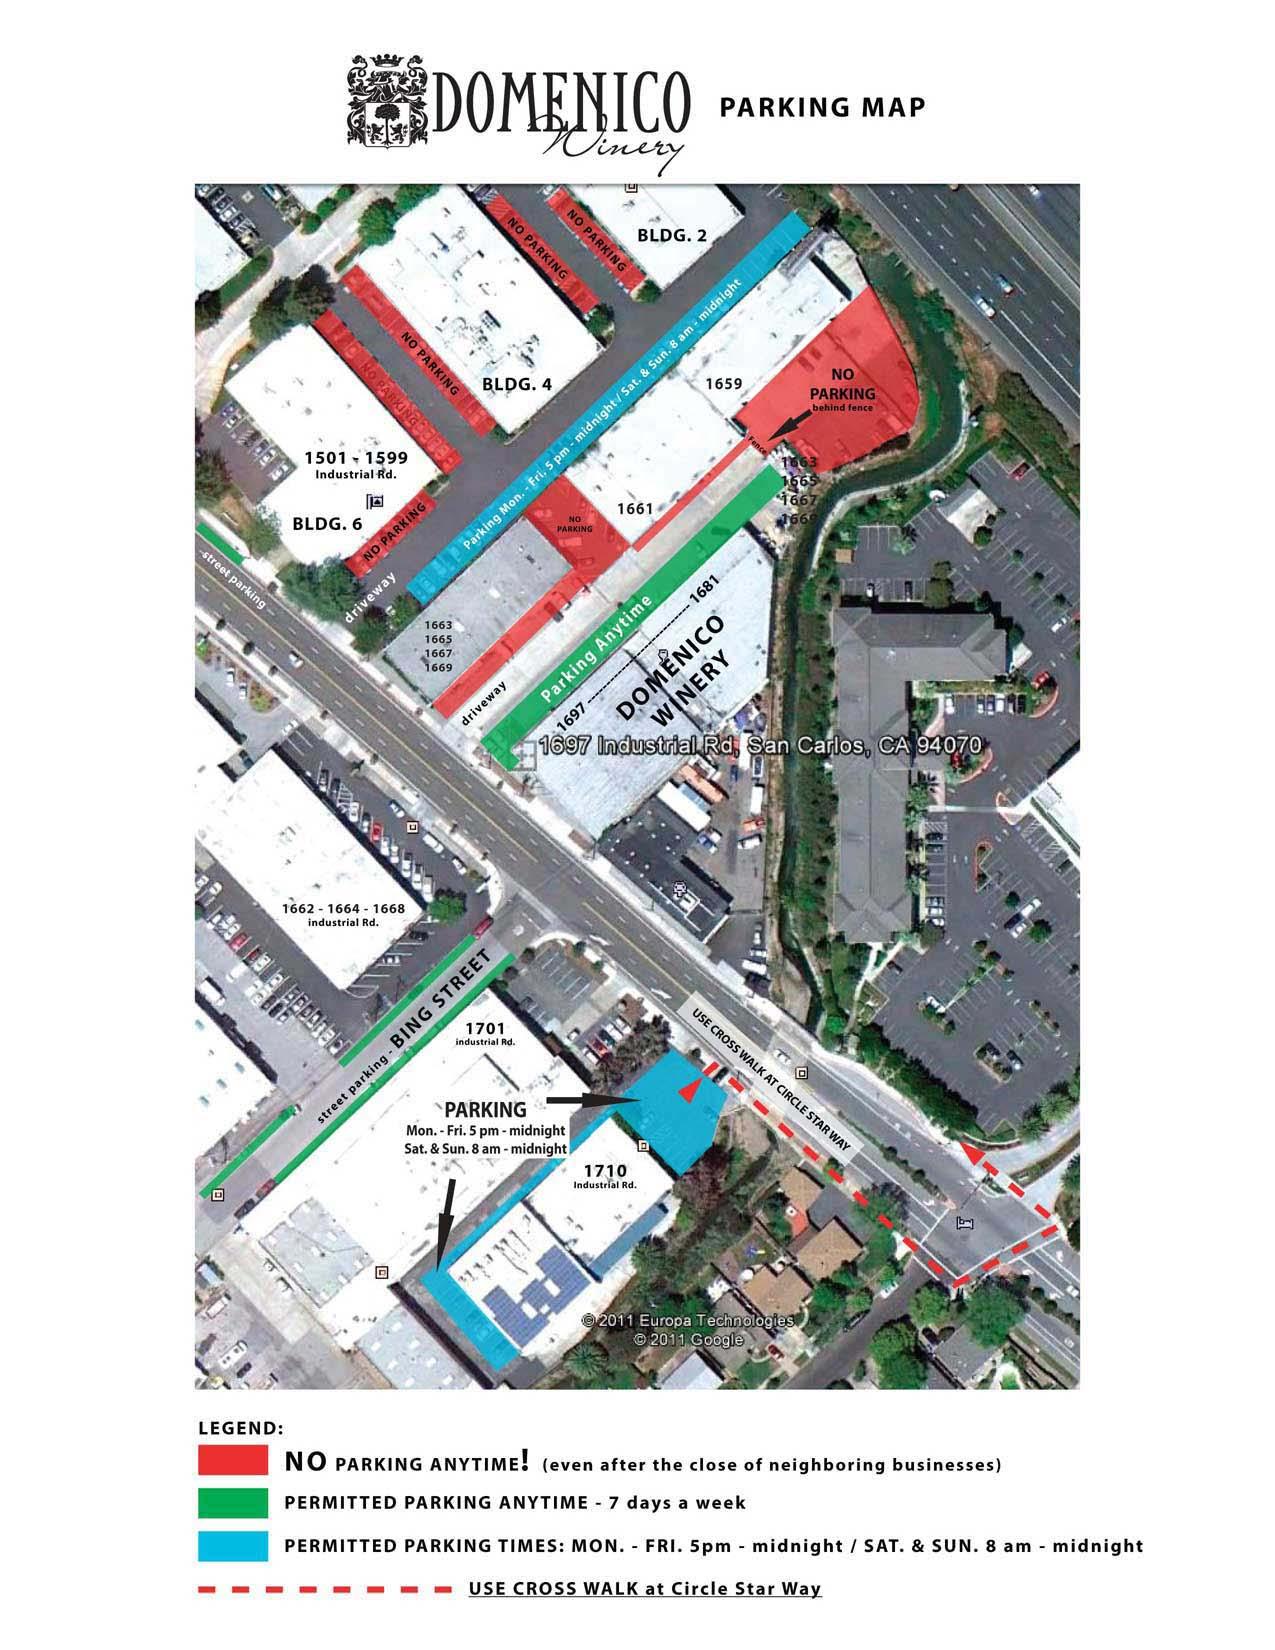 Domenico Parking Map